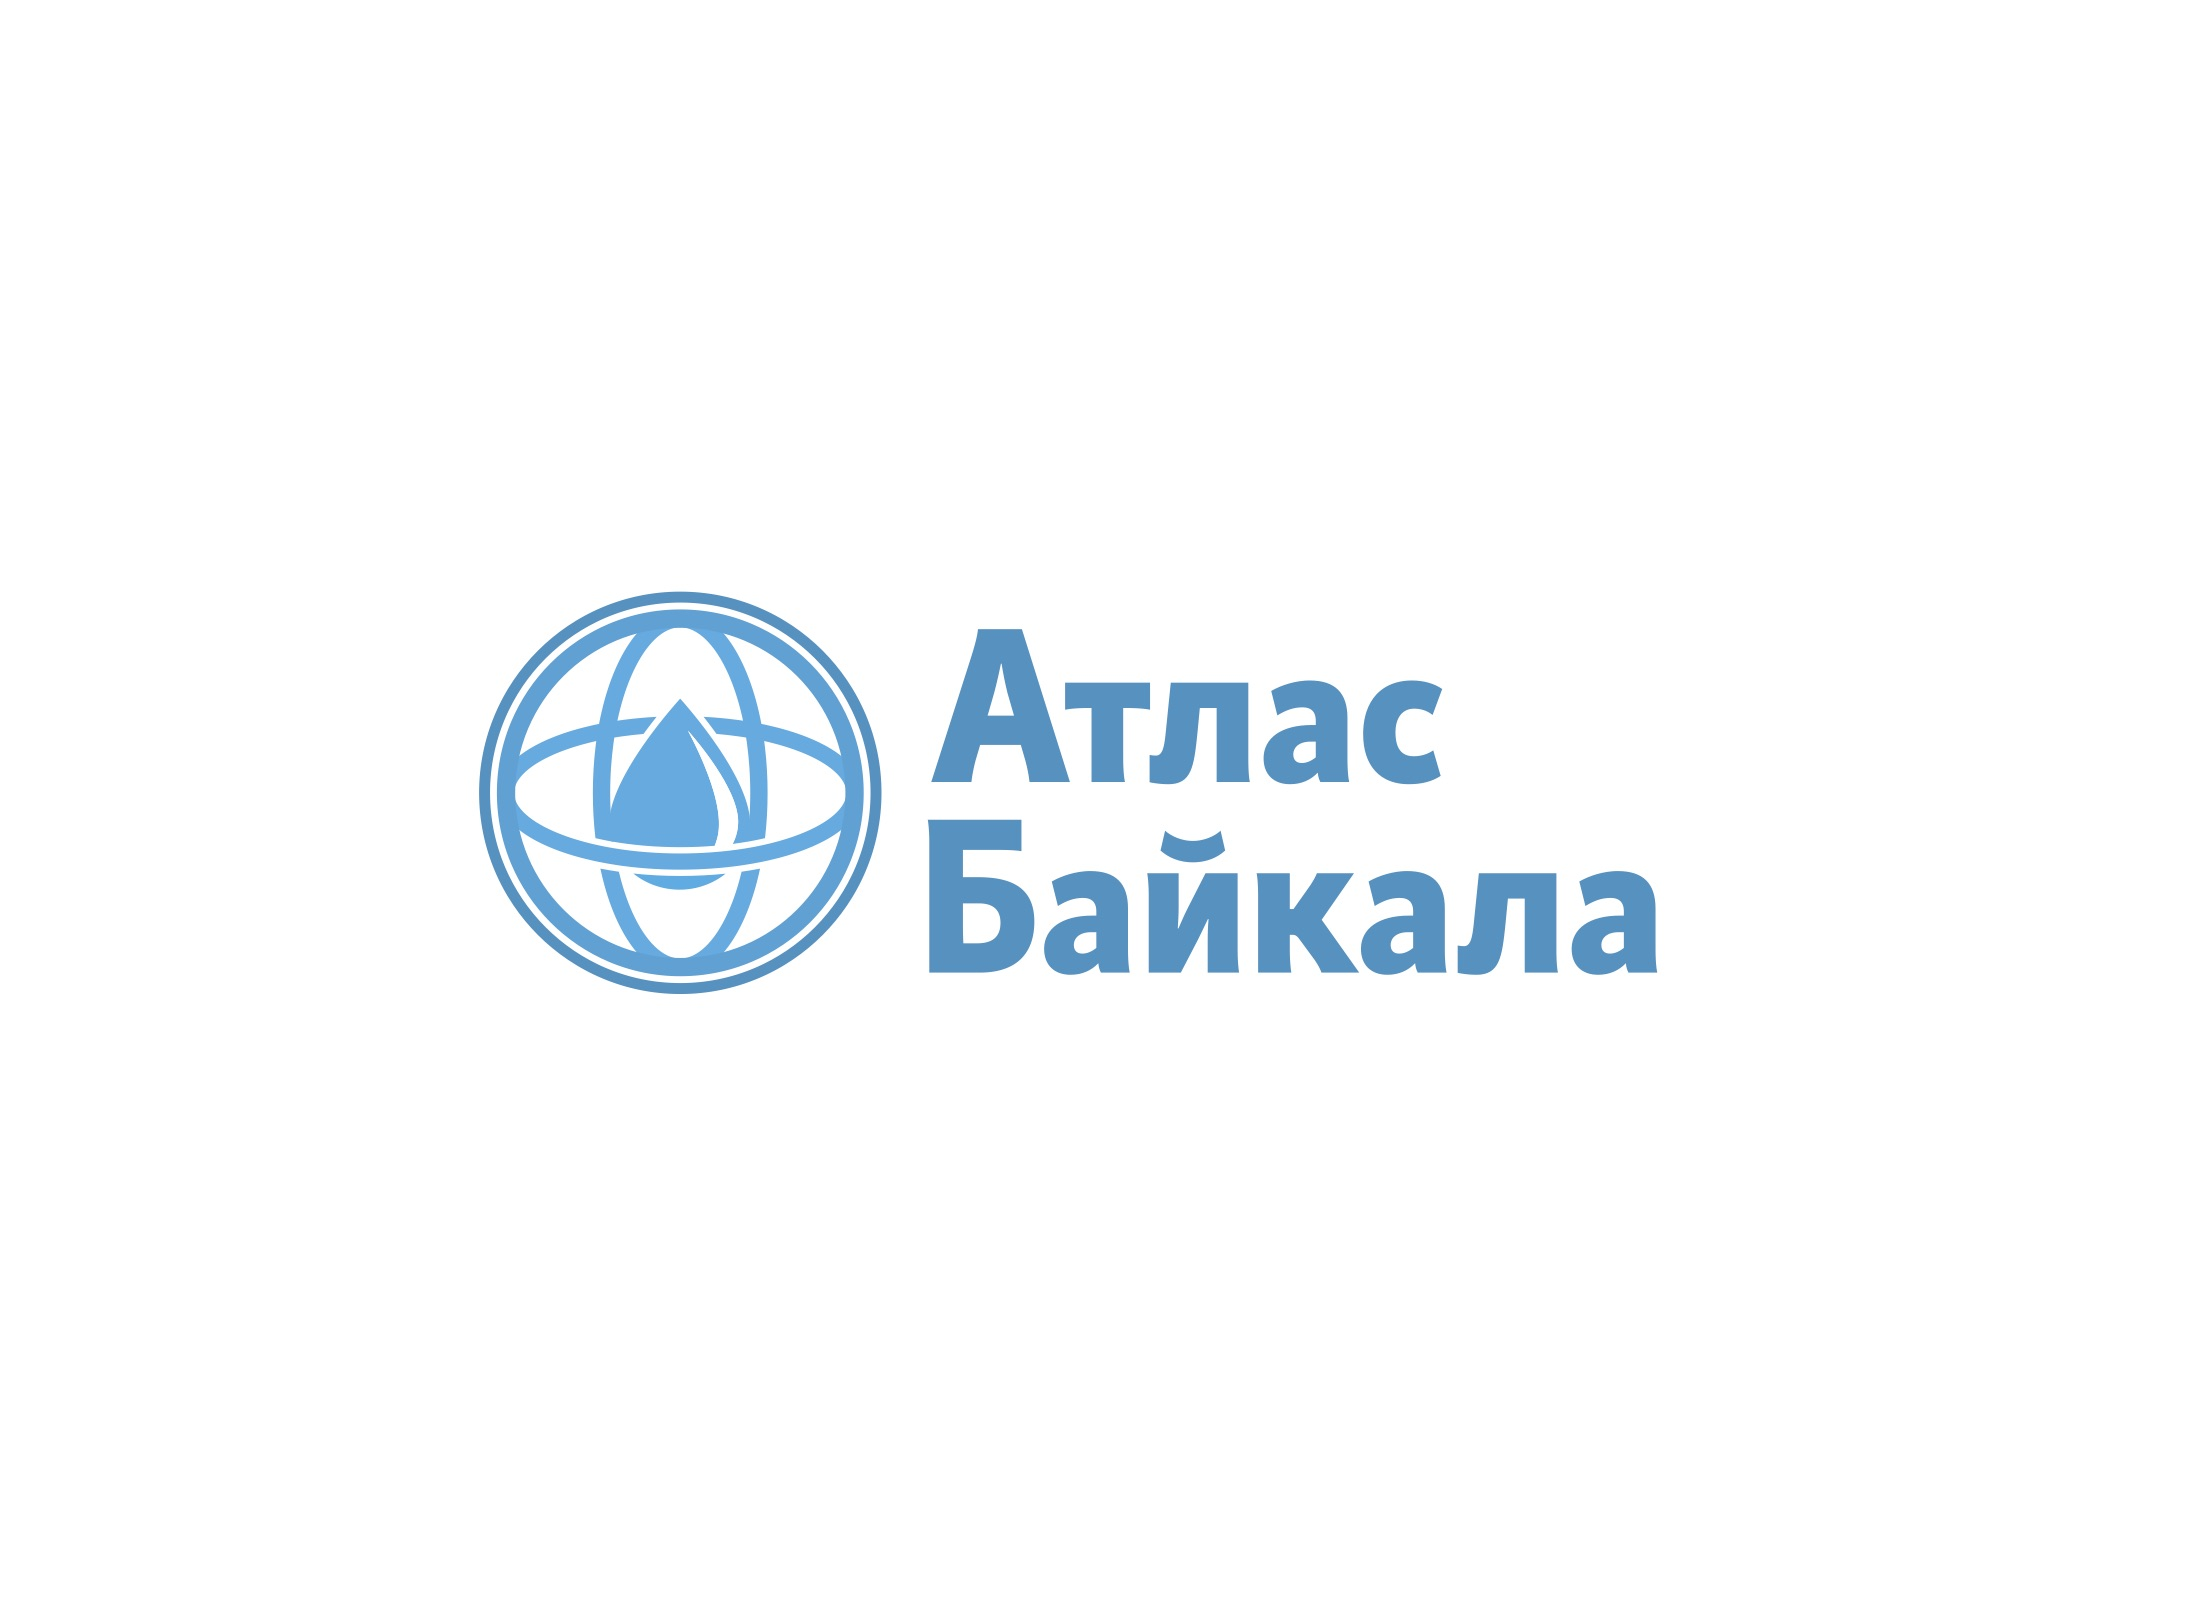 Разработка логотипа Атлас Байкала фото f_2385b022ae24e0bb.jpg